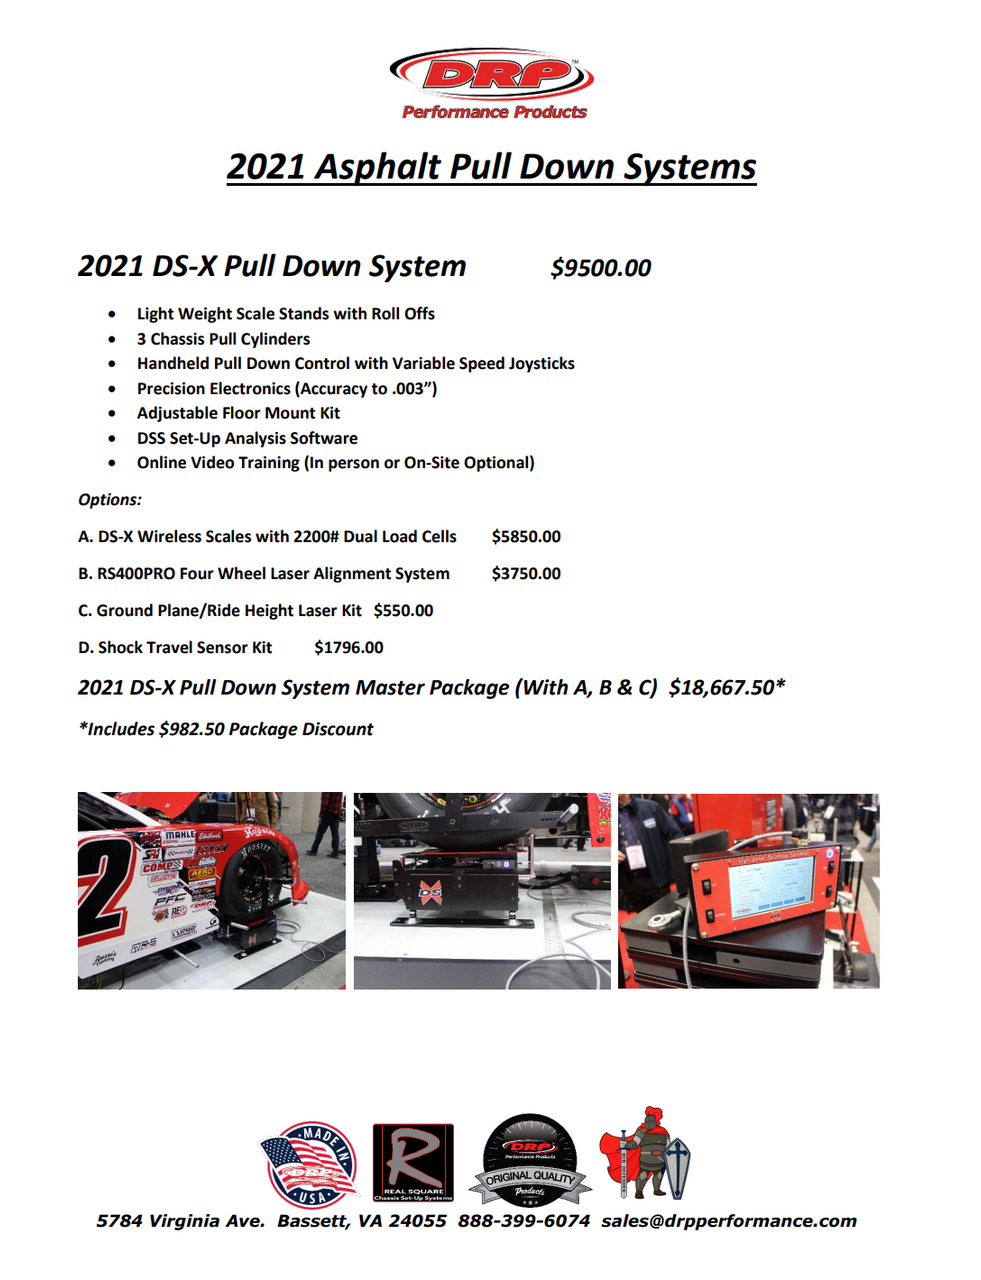 DS-X Asphalt Pull Down System